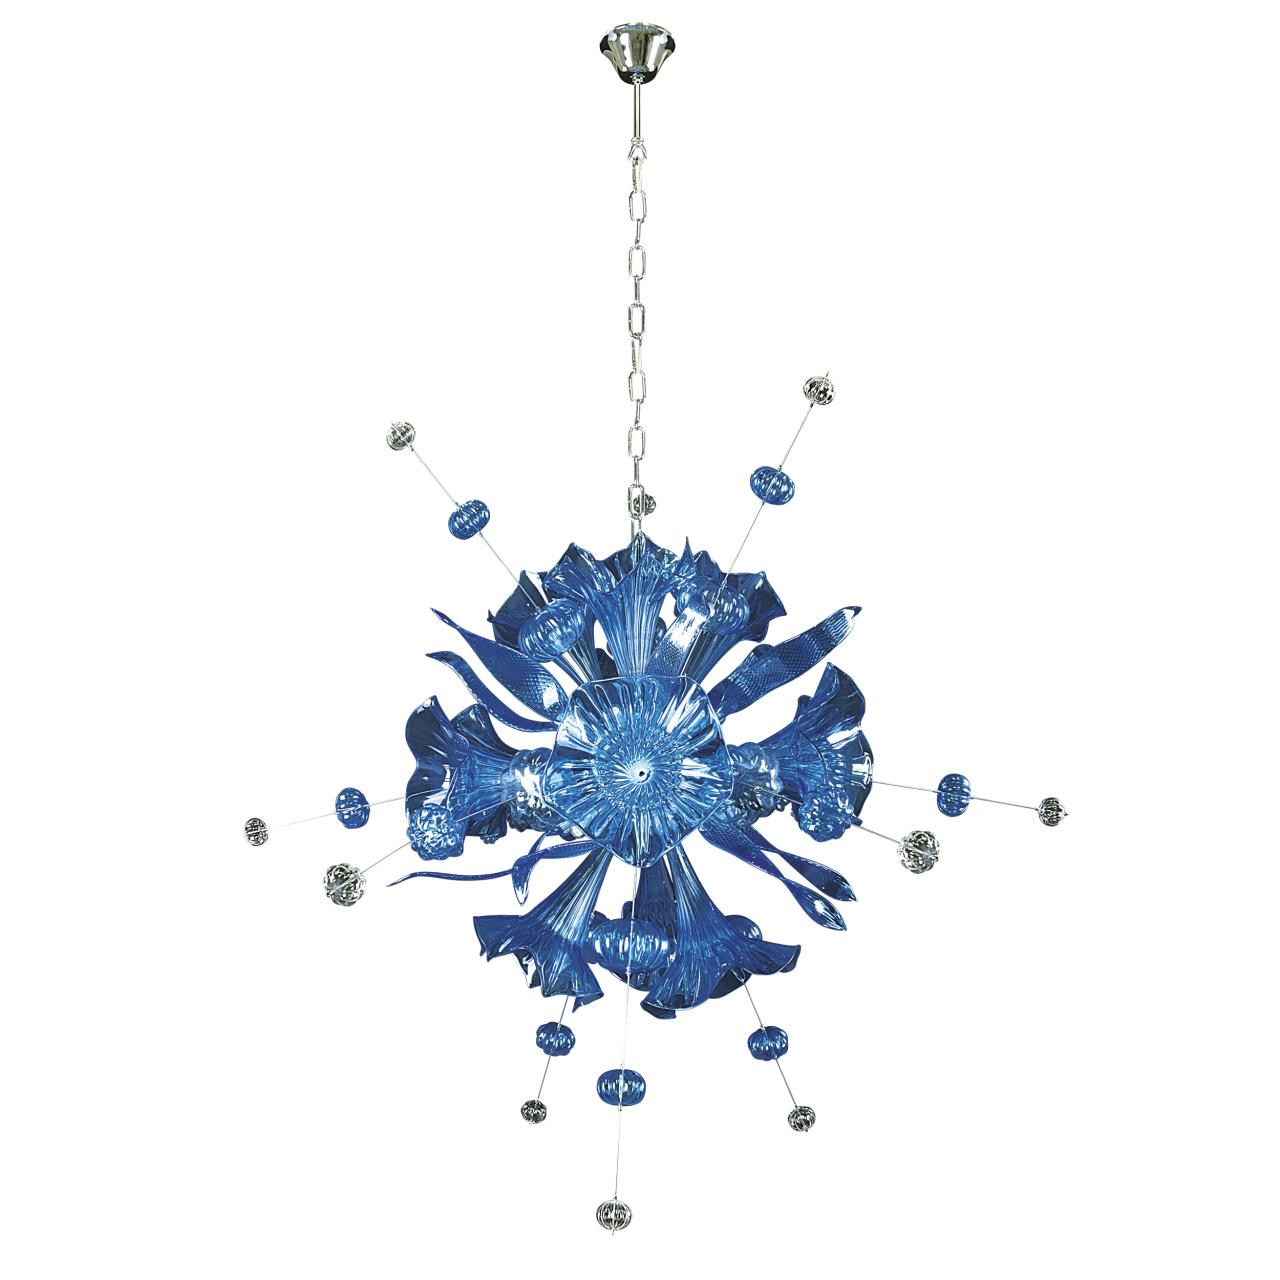 Люстра подвесная Celesta 12х6W (Led) G9 небесно голубой Lightstar 893121